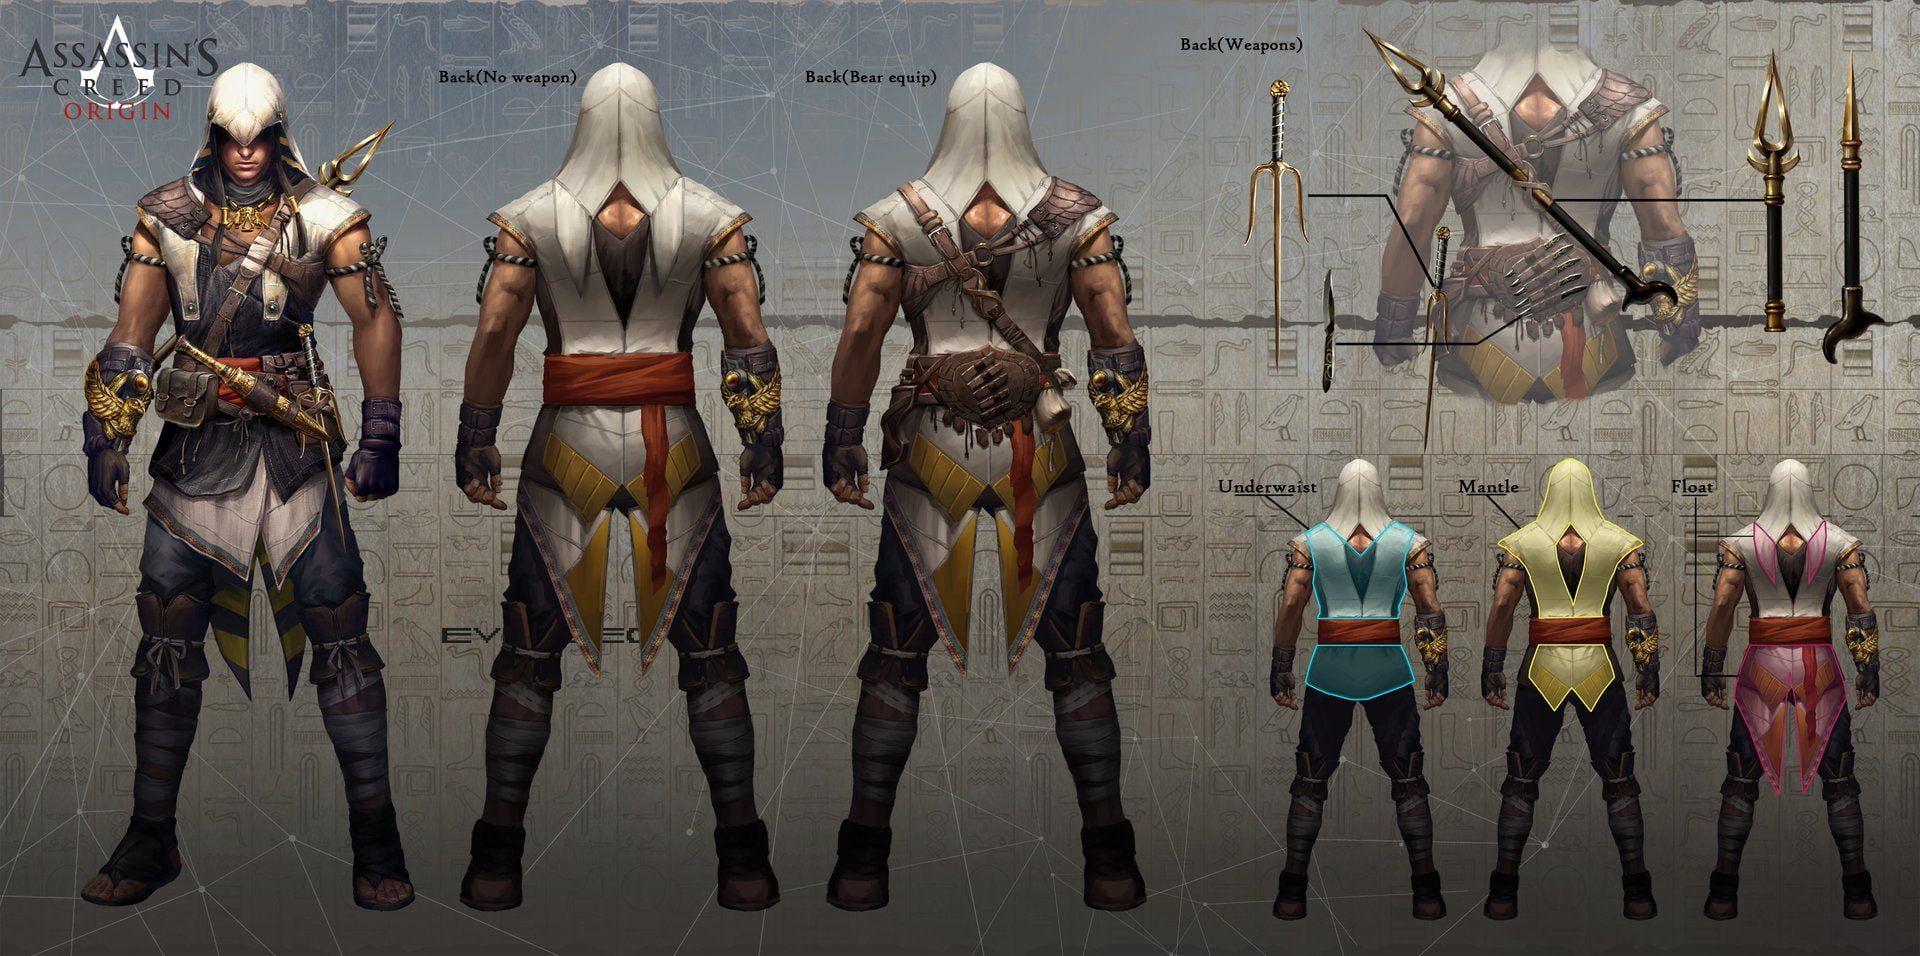 Zendha Assassins Creed Wallpapers 4k